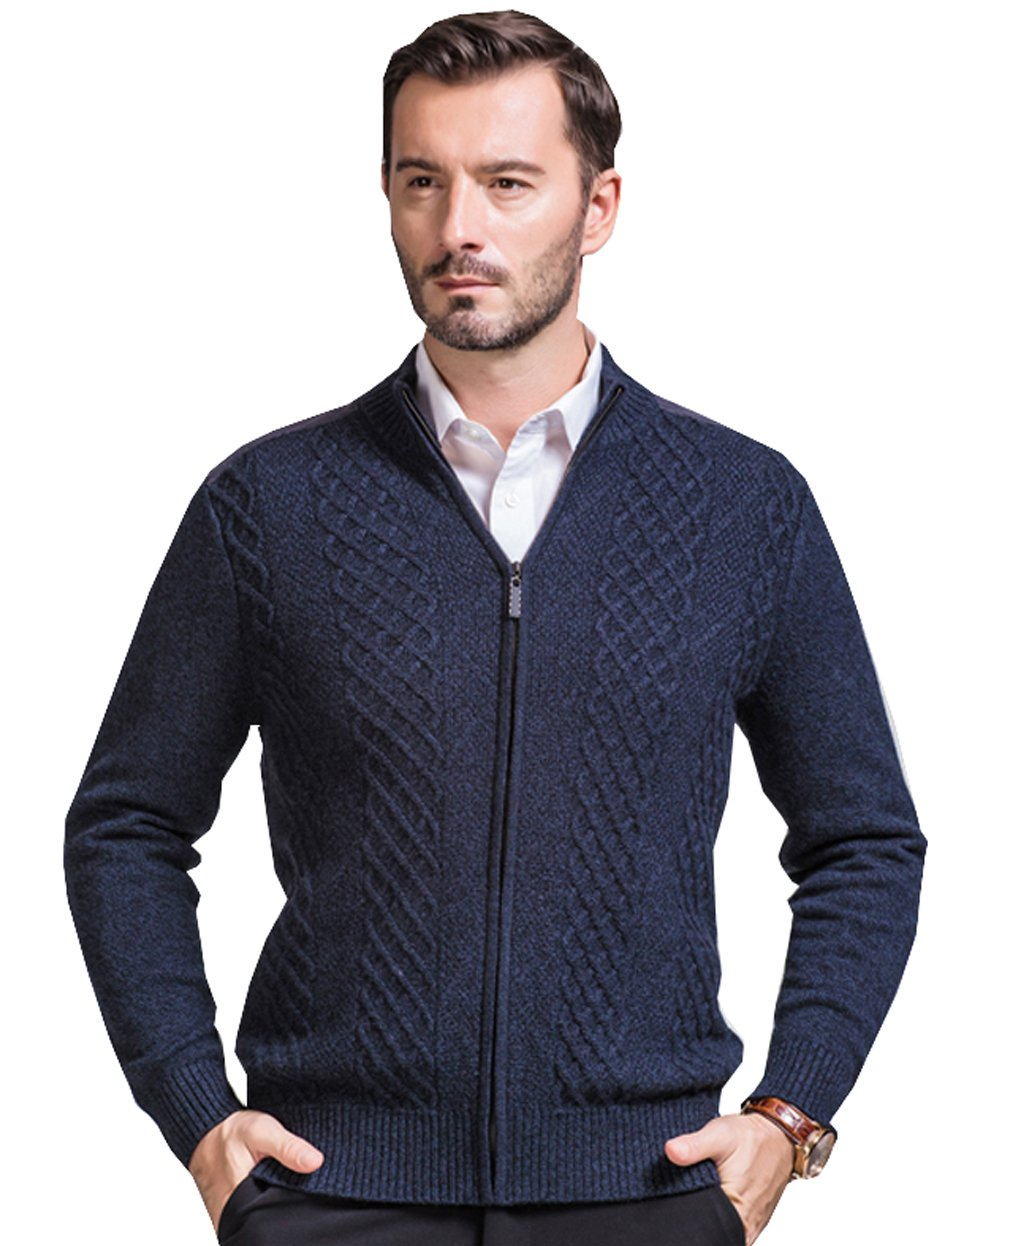 METERDE Men's Fashion Long Sleeve Knit Thick Winter Cardigan Deep Grey XL